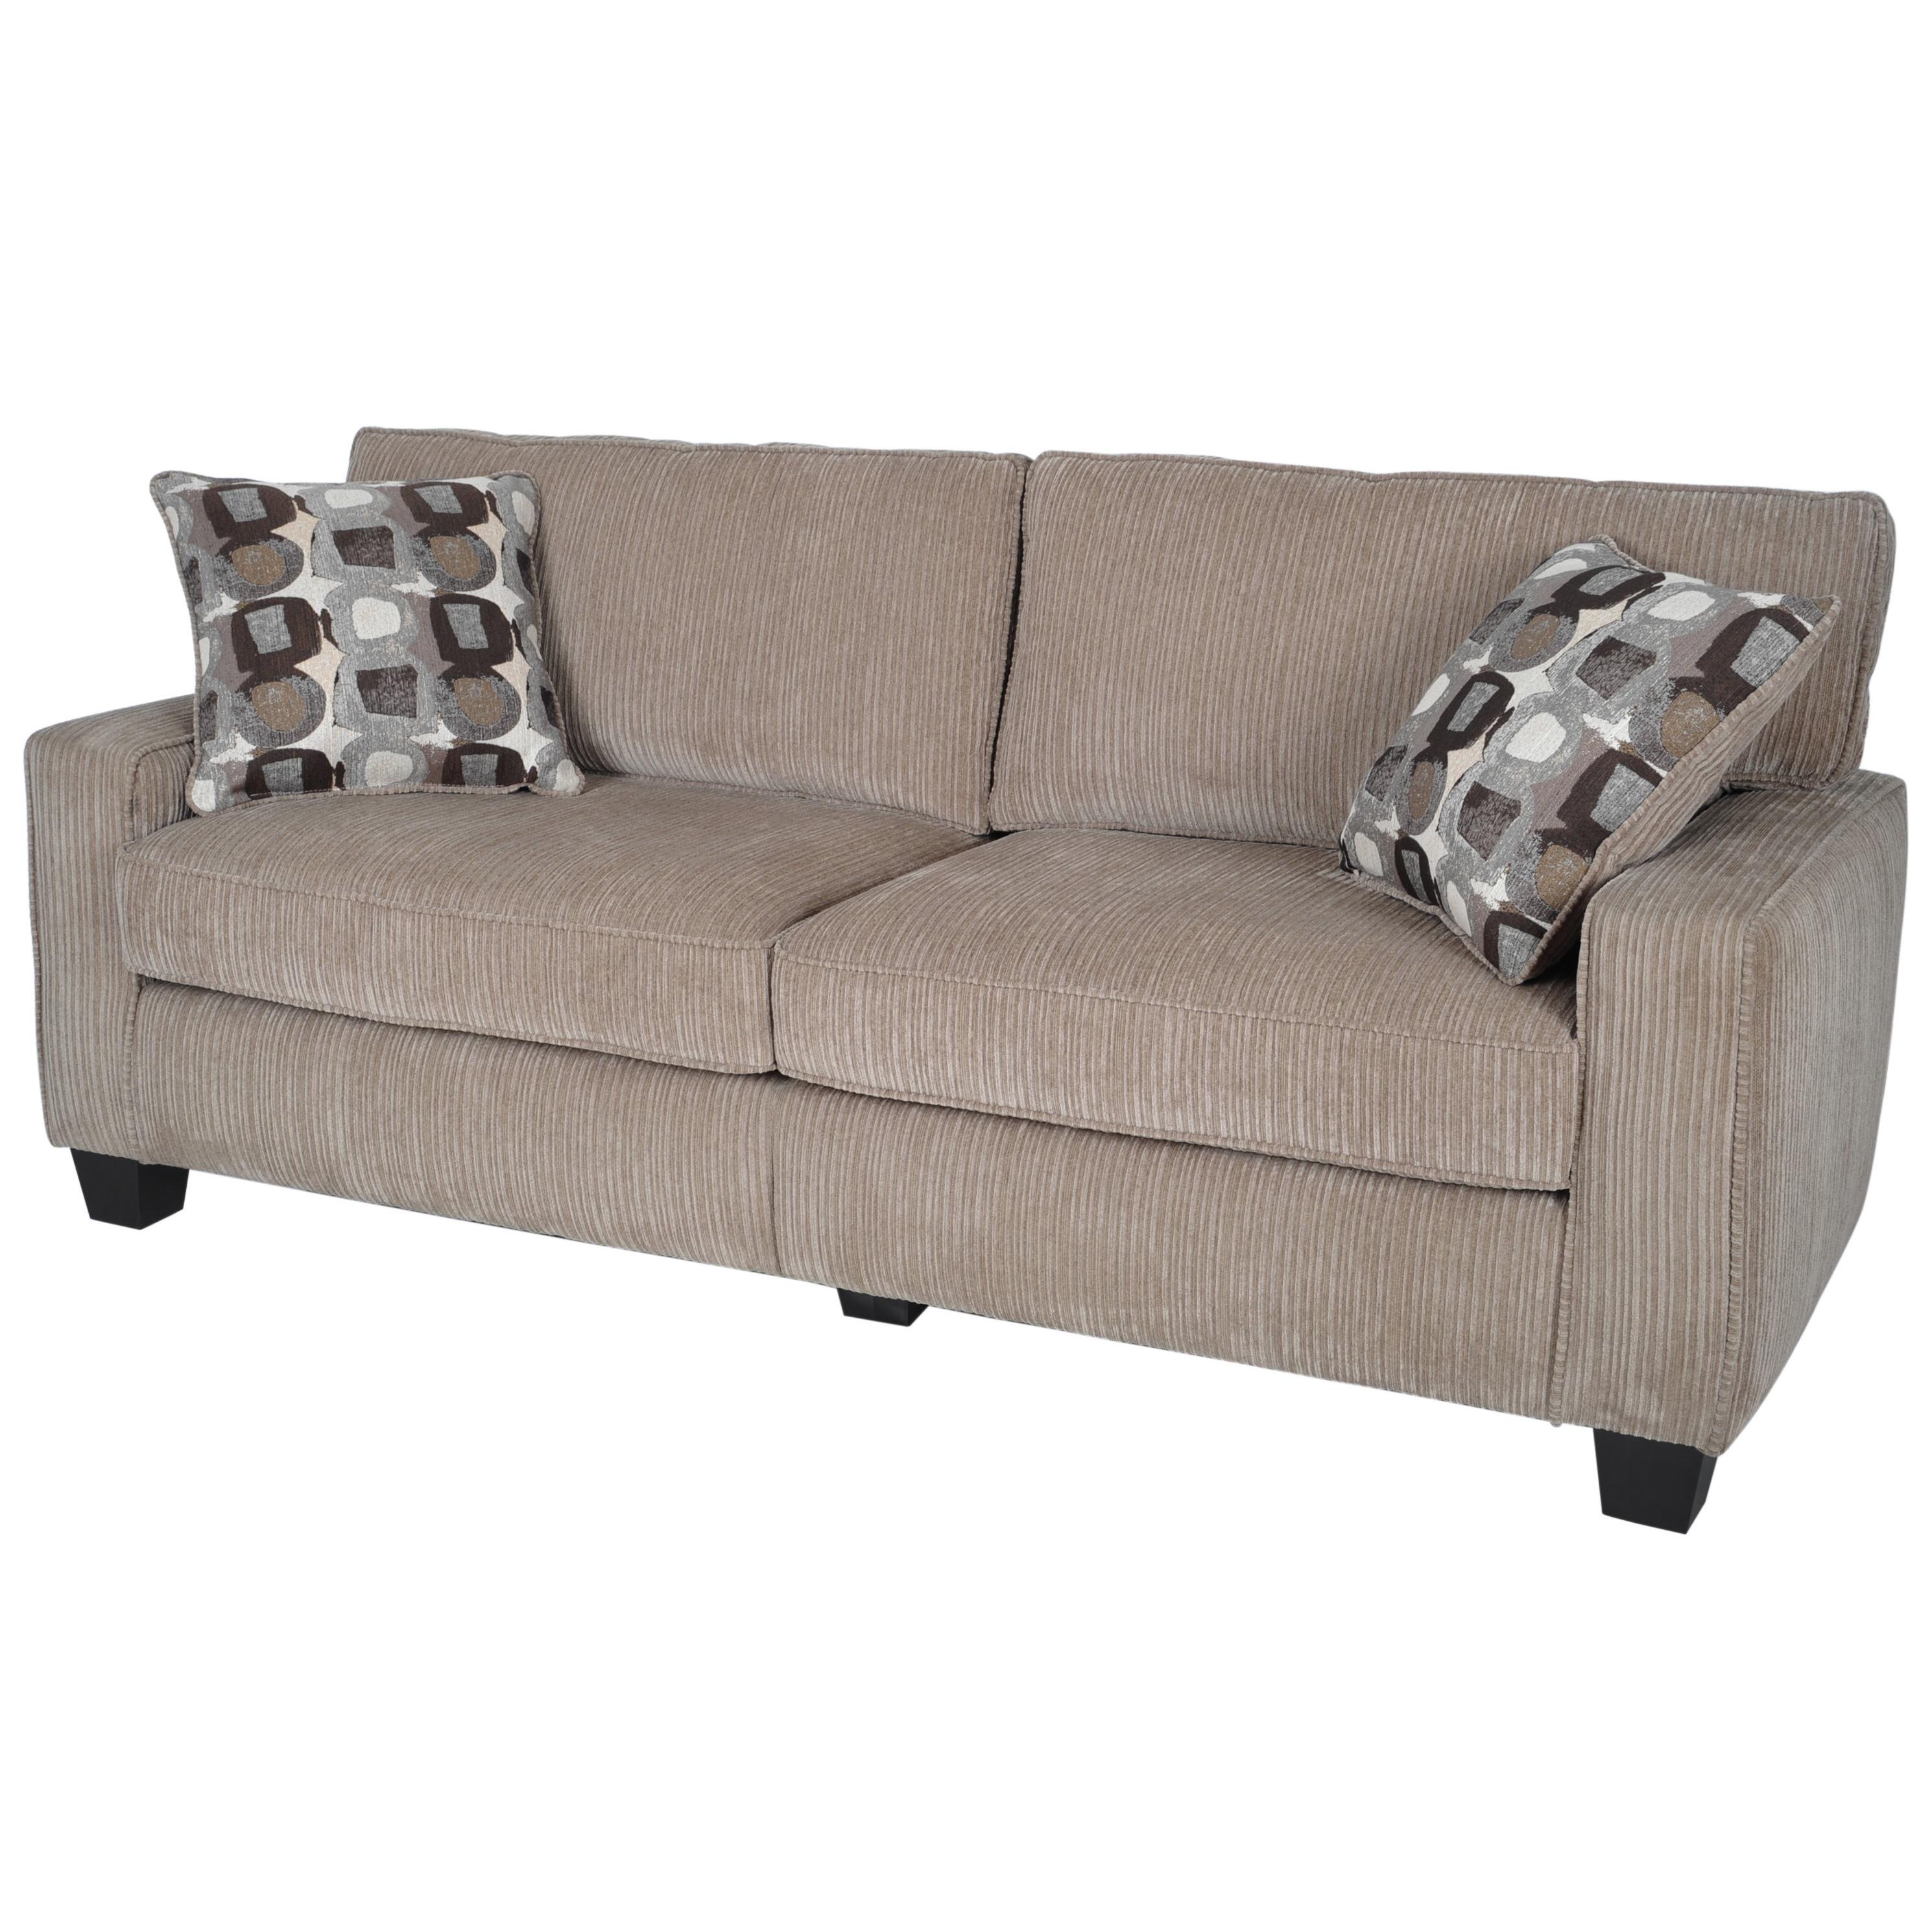 Shop Serta RTA Santa Cruz Collection 78-inch Platinum Fabric Sofa ...